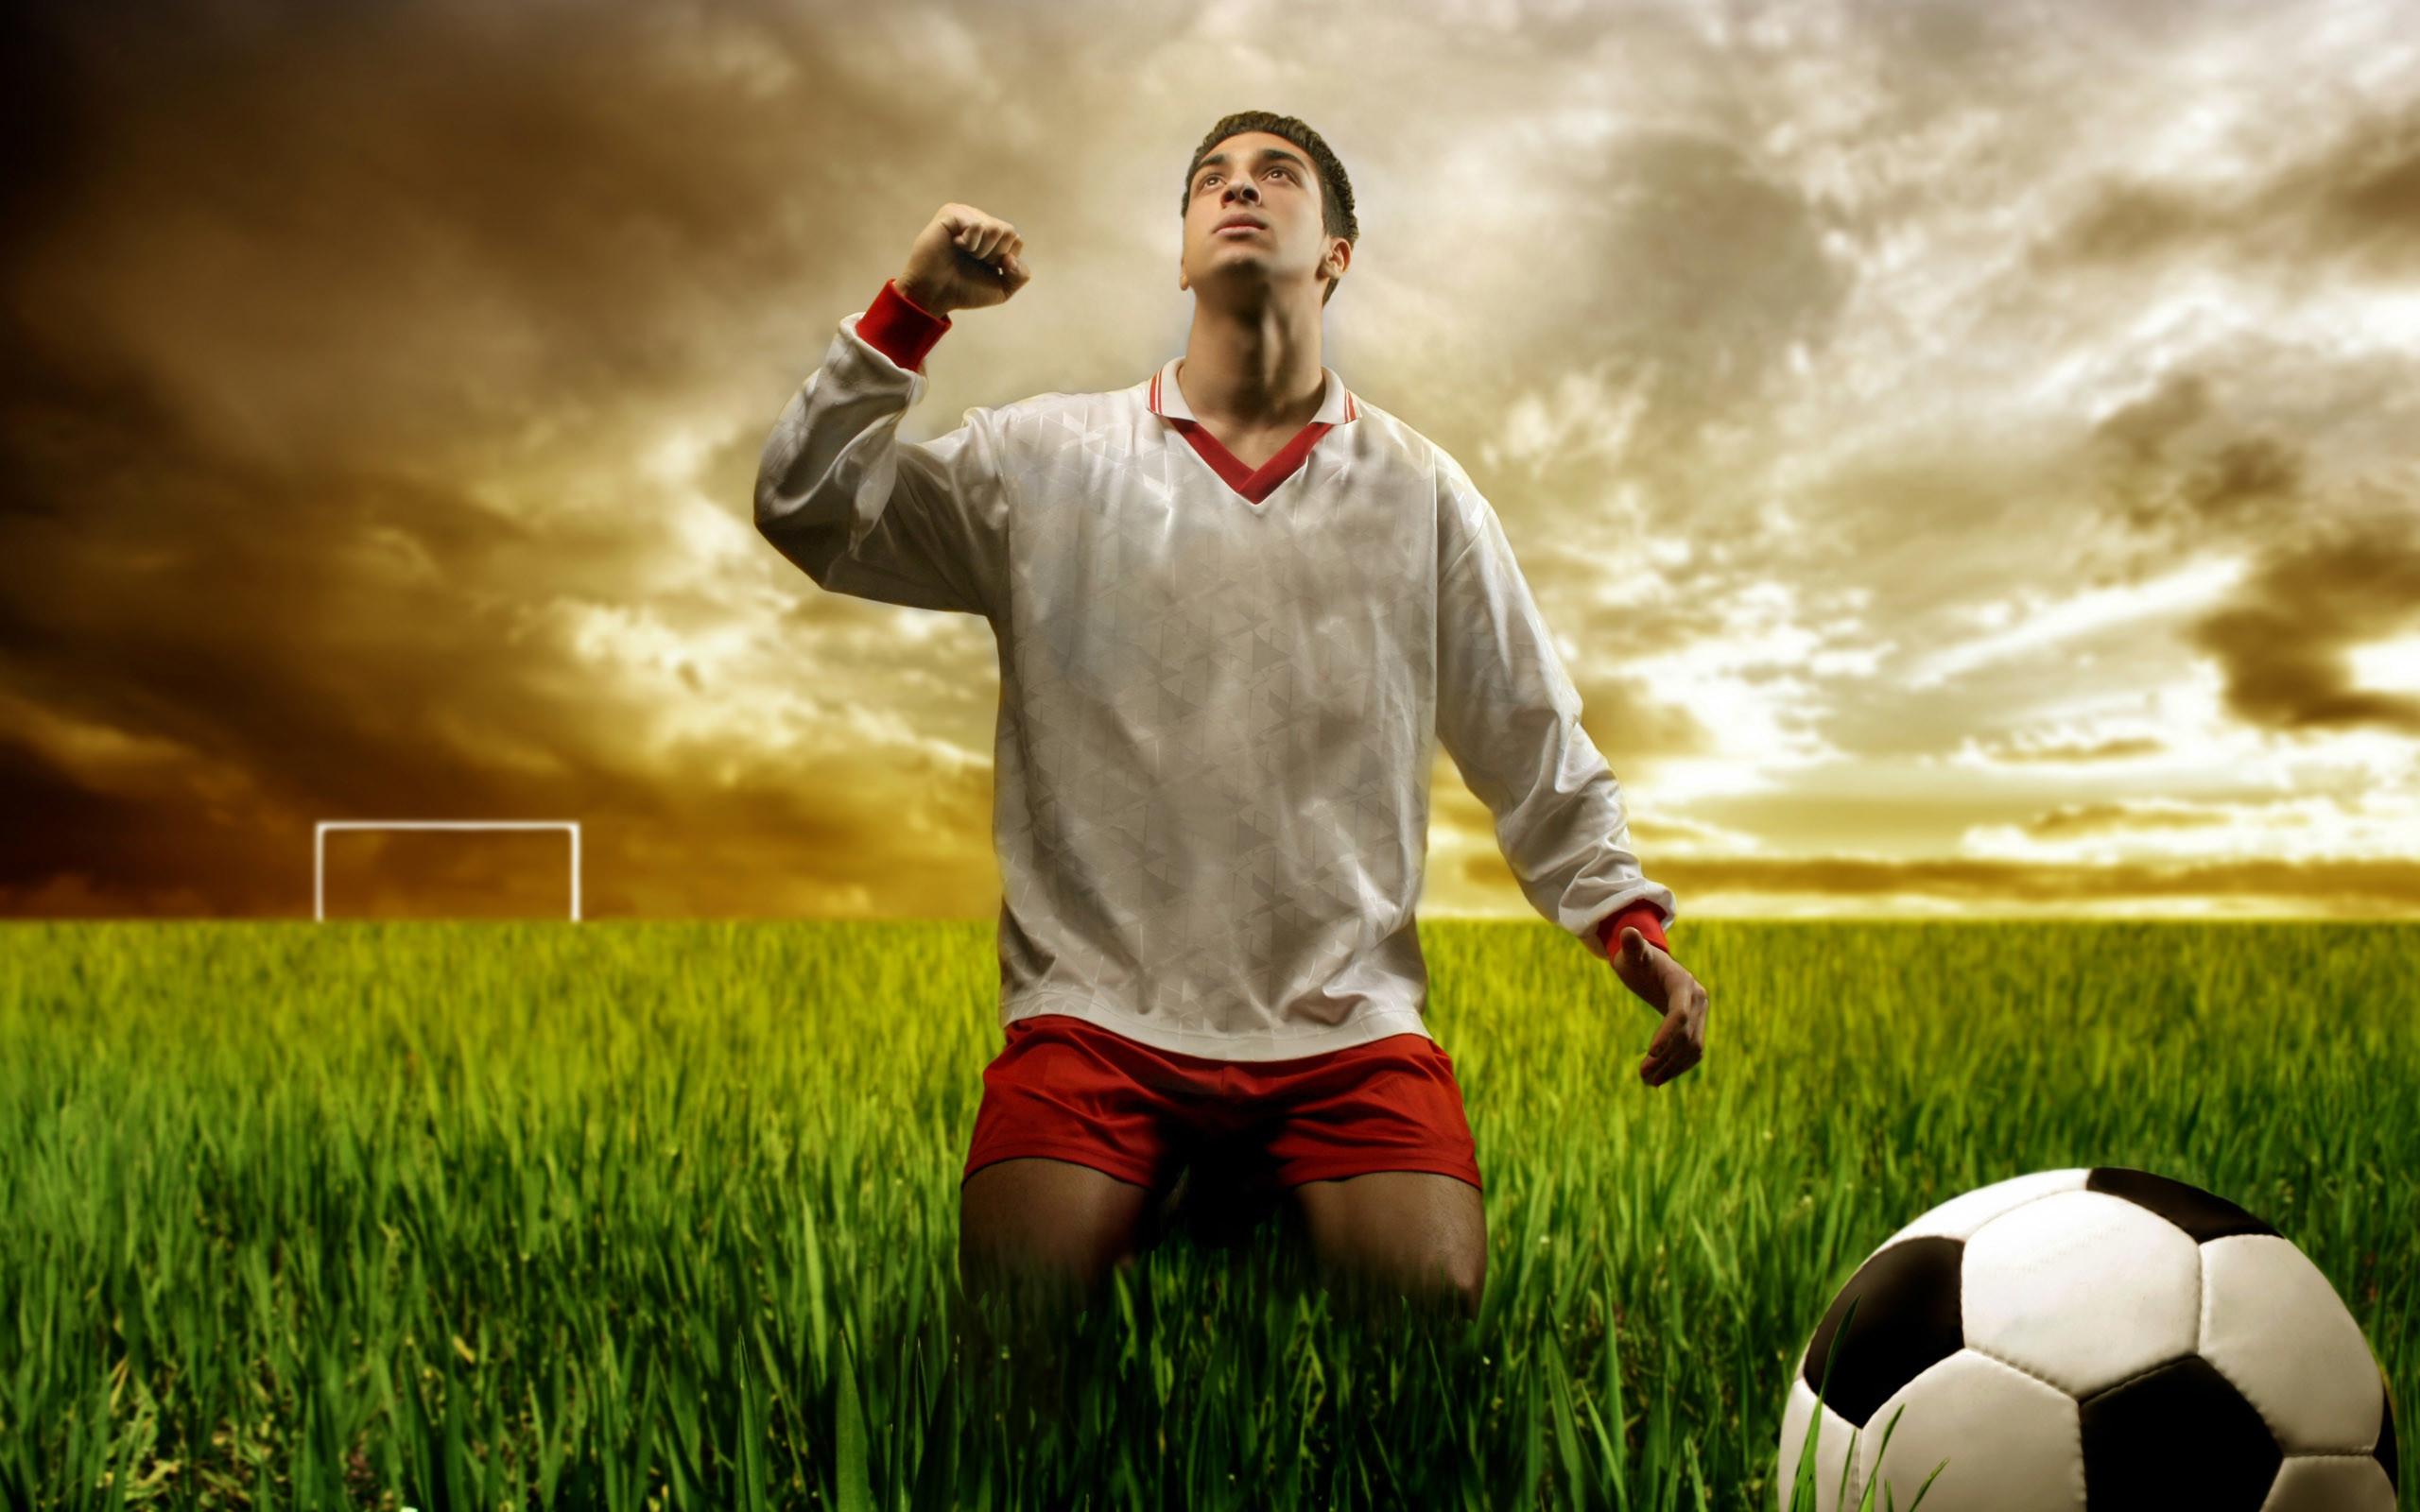 ultras wallpaper, soccer legends wallpaper